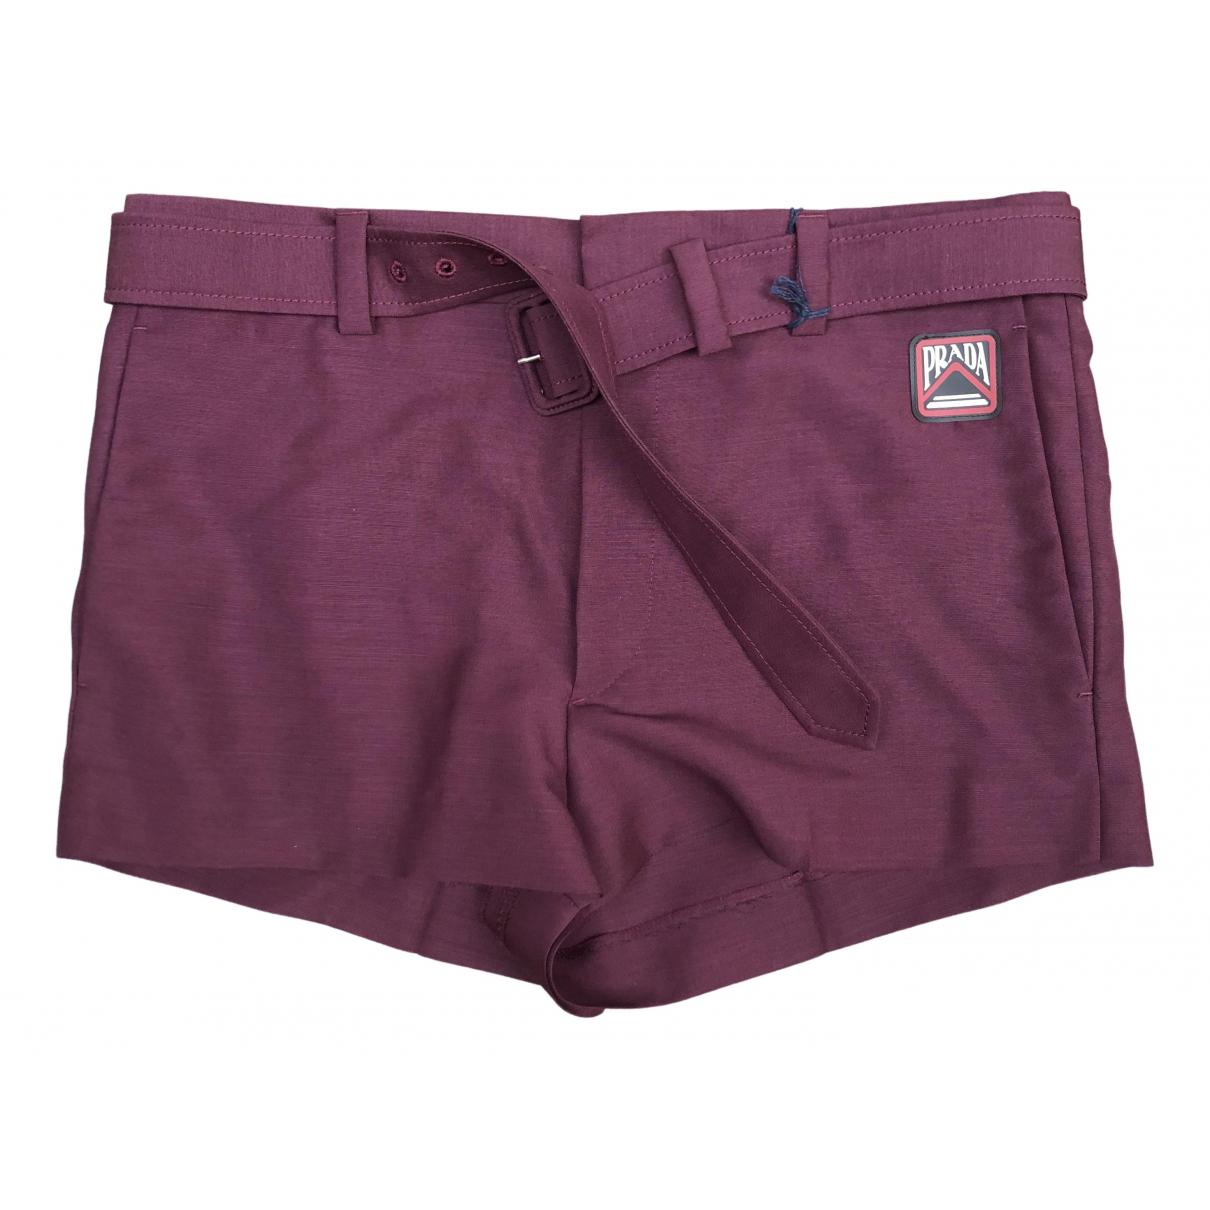 Prada \N Burgundy Shorts for Men 48 IT